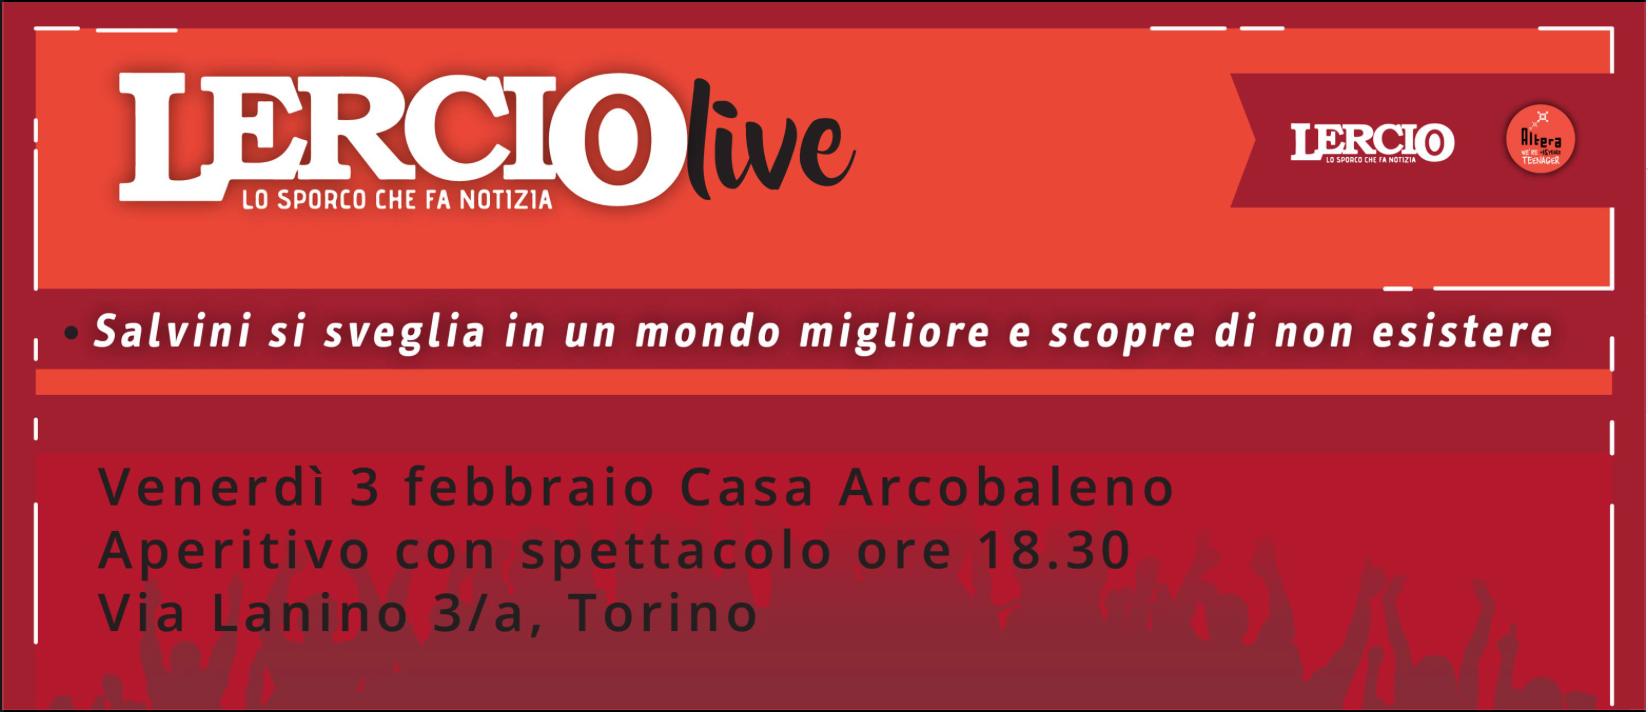 Lercio live